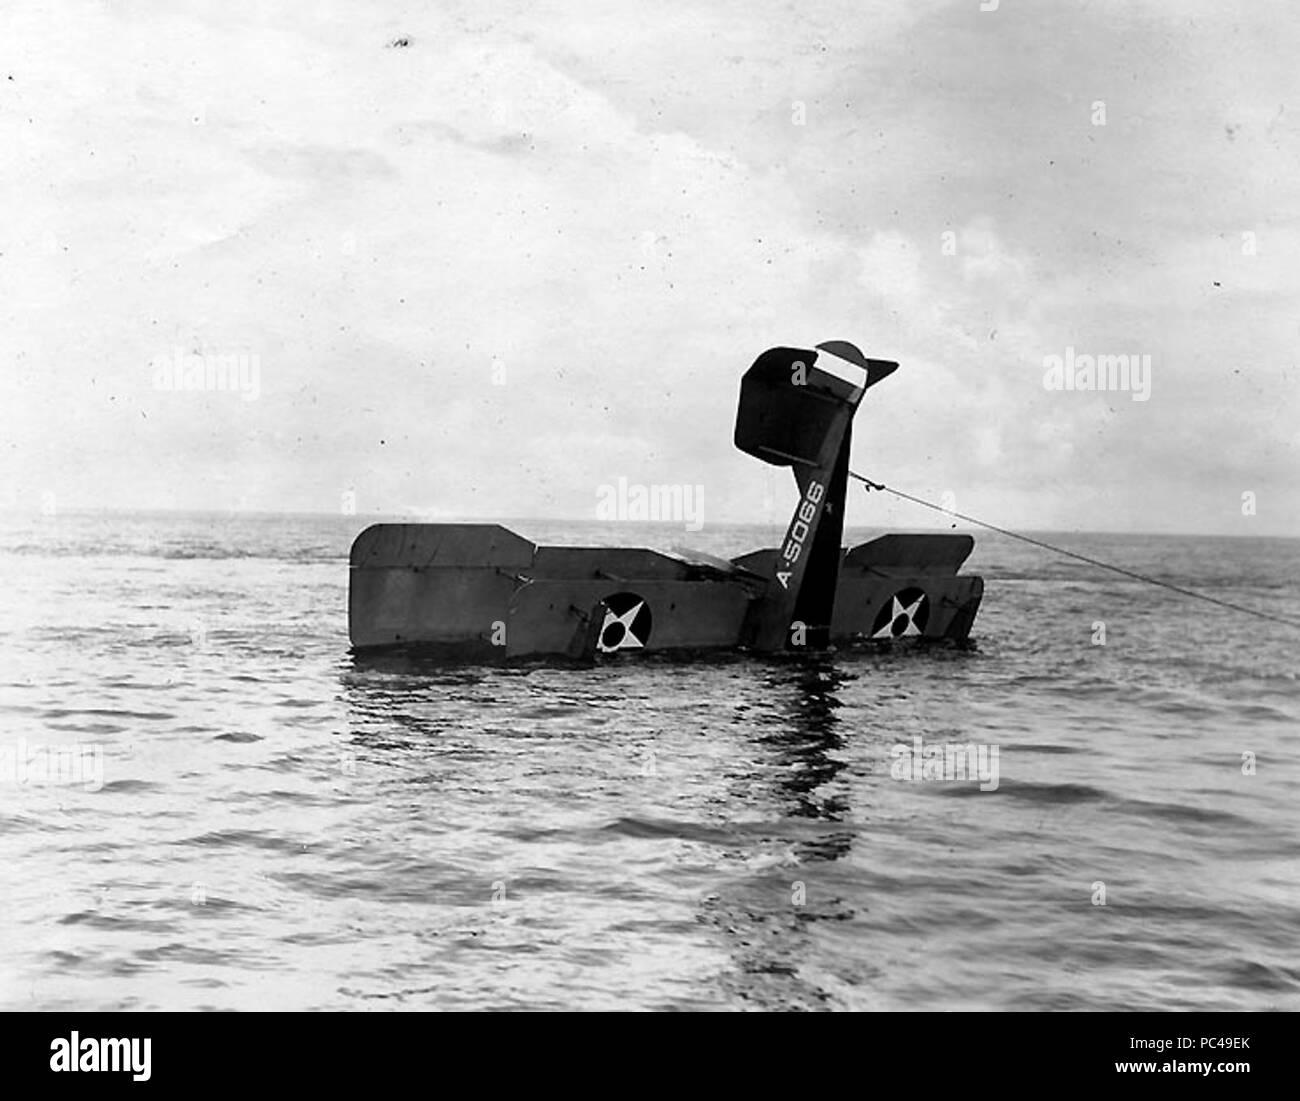 Aero-40 wreck. - Stock Image